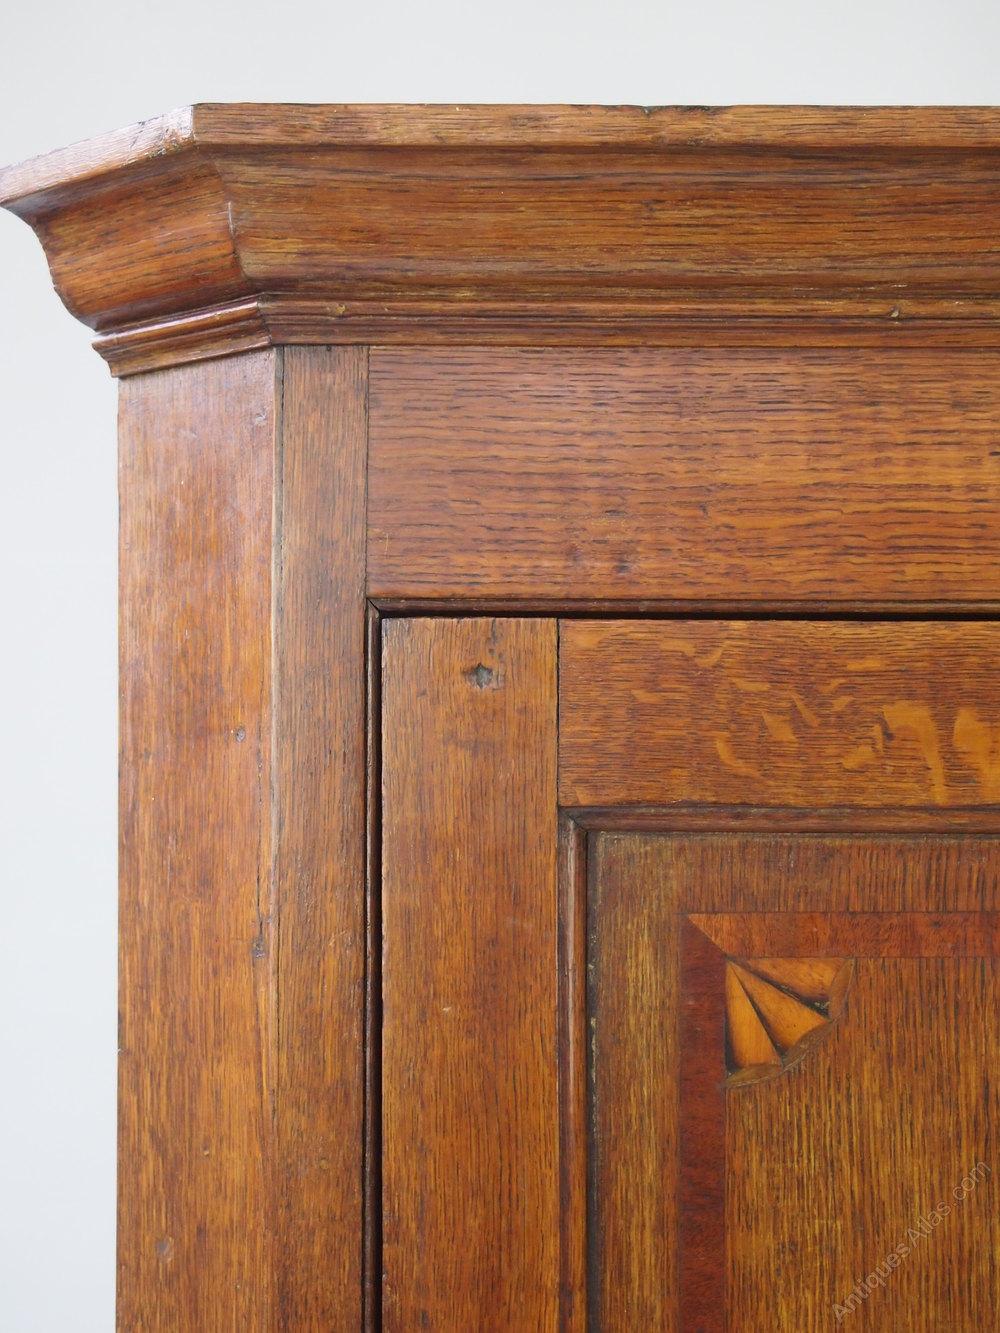 ... Antique Corner Cupboards Georgian Oak Corner Cupboard Hanging Wall  Cabinet %%alt5%% ... - Georgian Oak Corner Cupboard /Hanging Wall Cabinet - Antiques Atlas